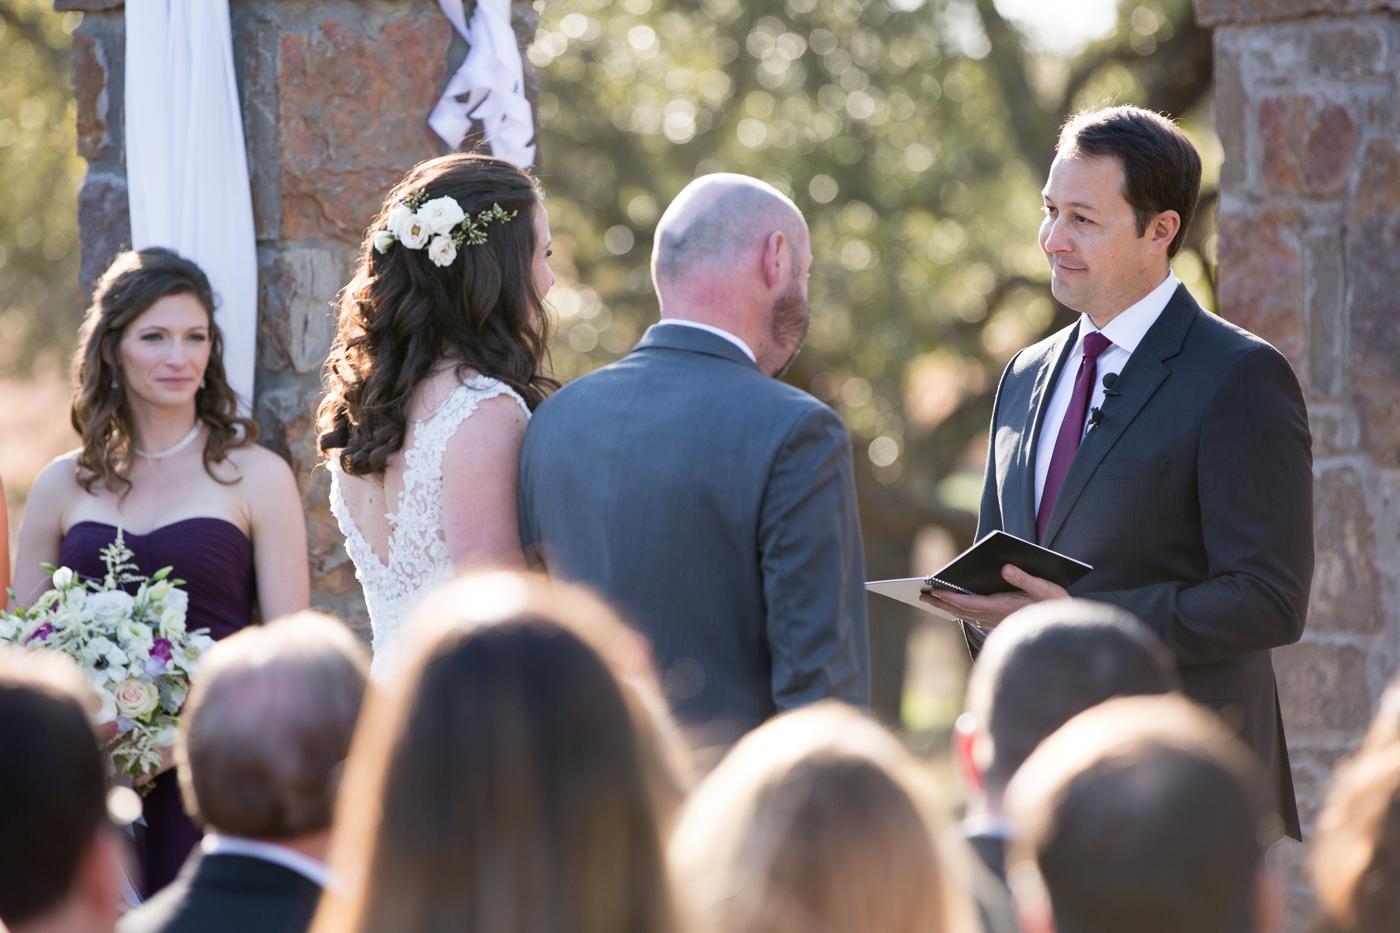 Austin-wedding-photo-and-video-020.jpg